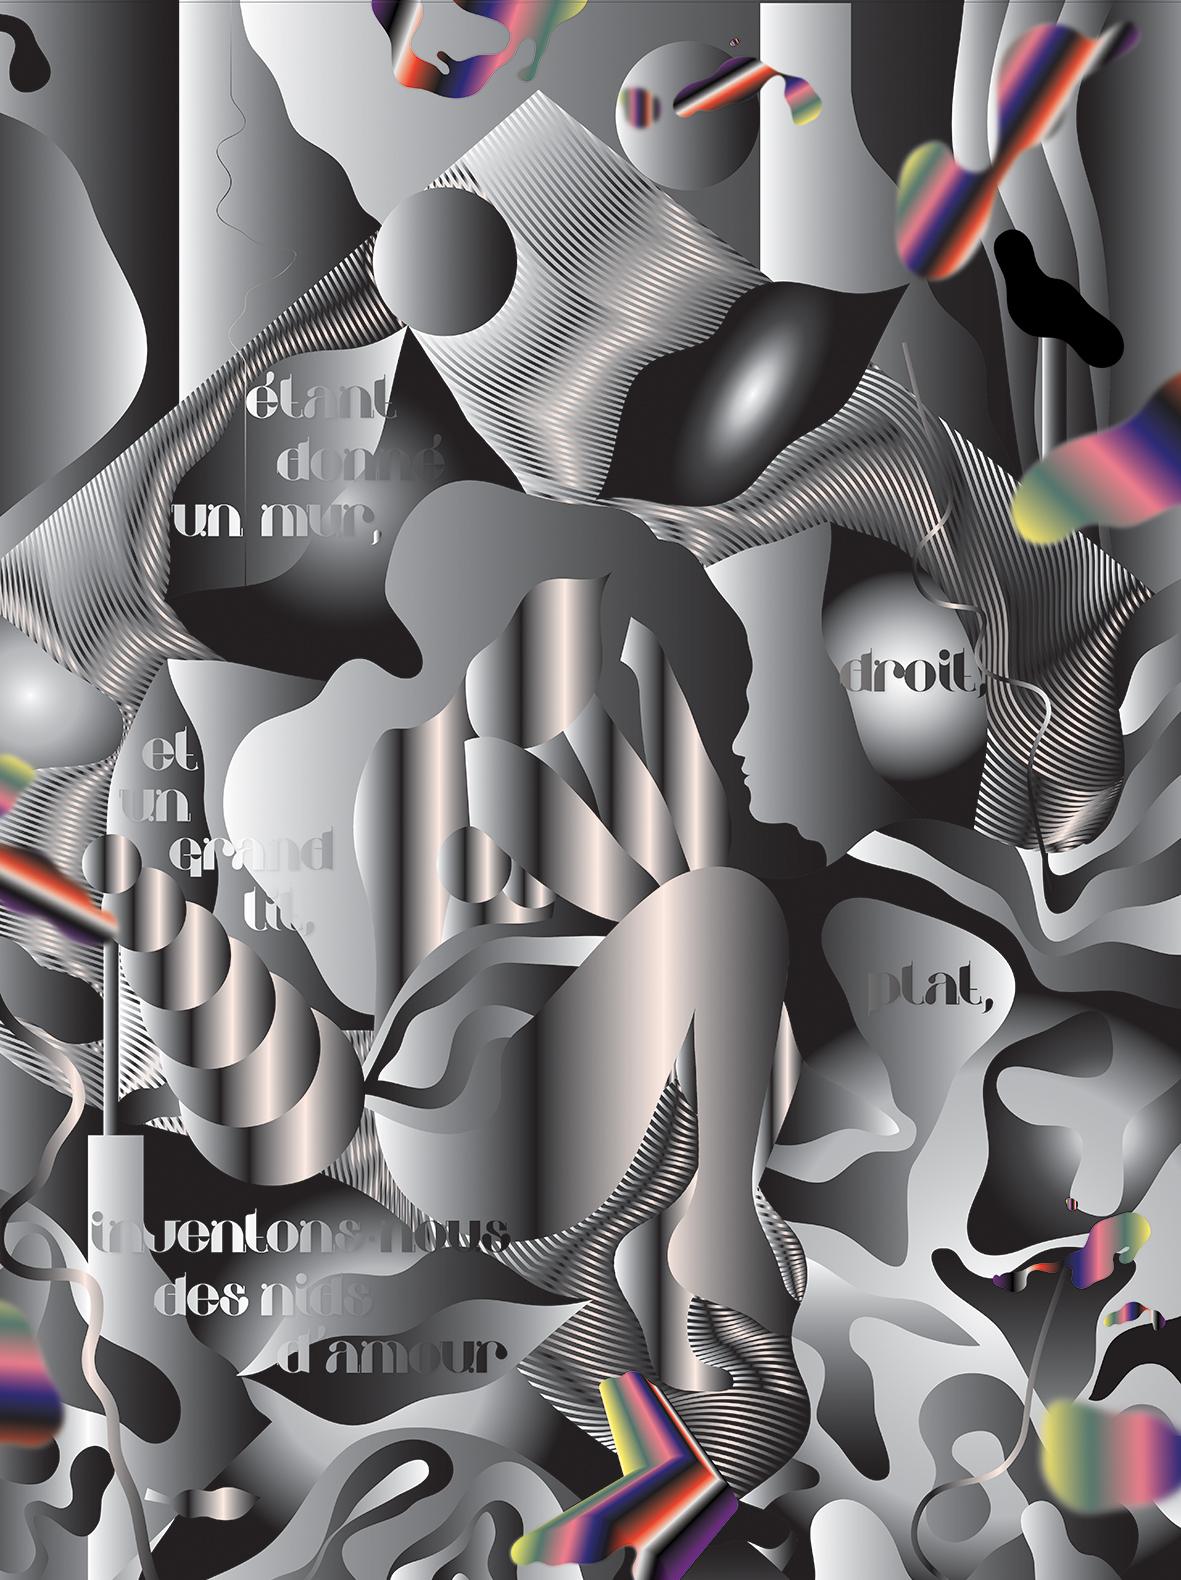 Graphisme, typographie & illustration